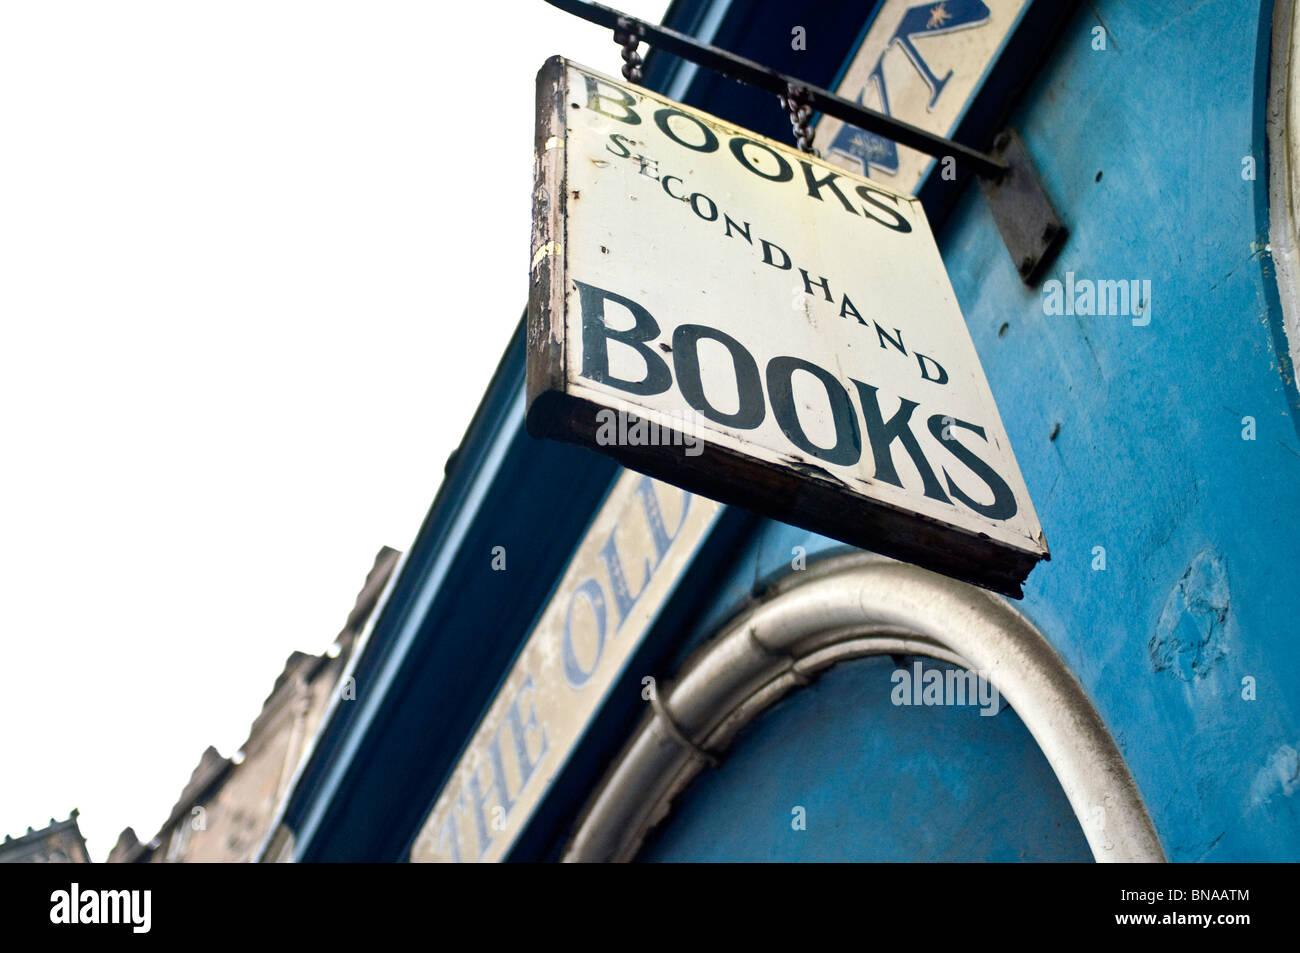 A secondhand bookshop sign, Edinburgh, Scotland - Stock Image